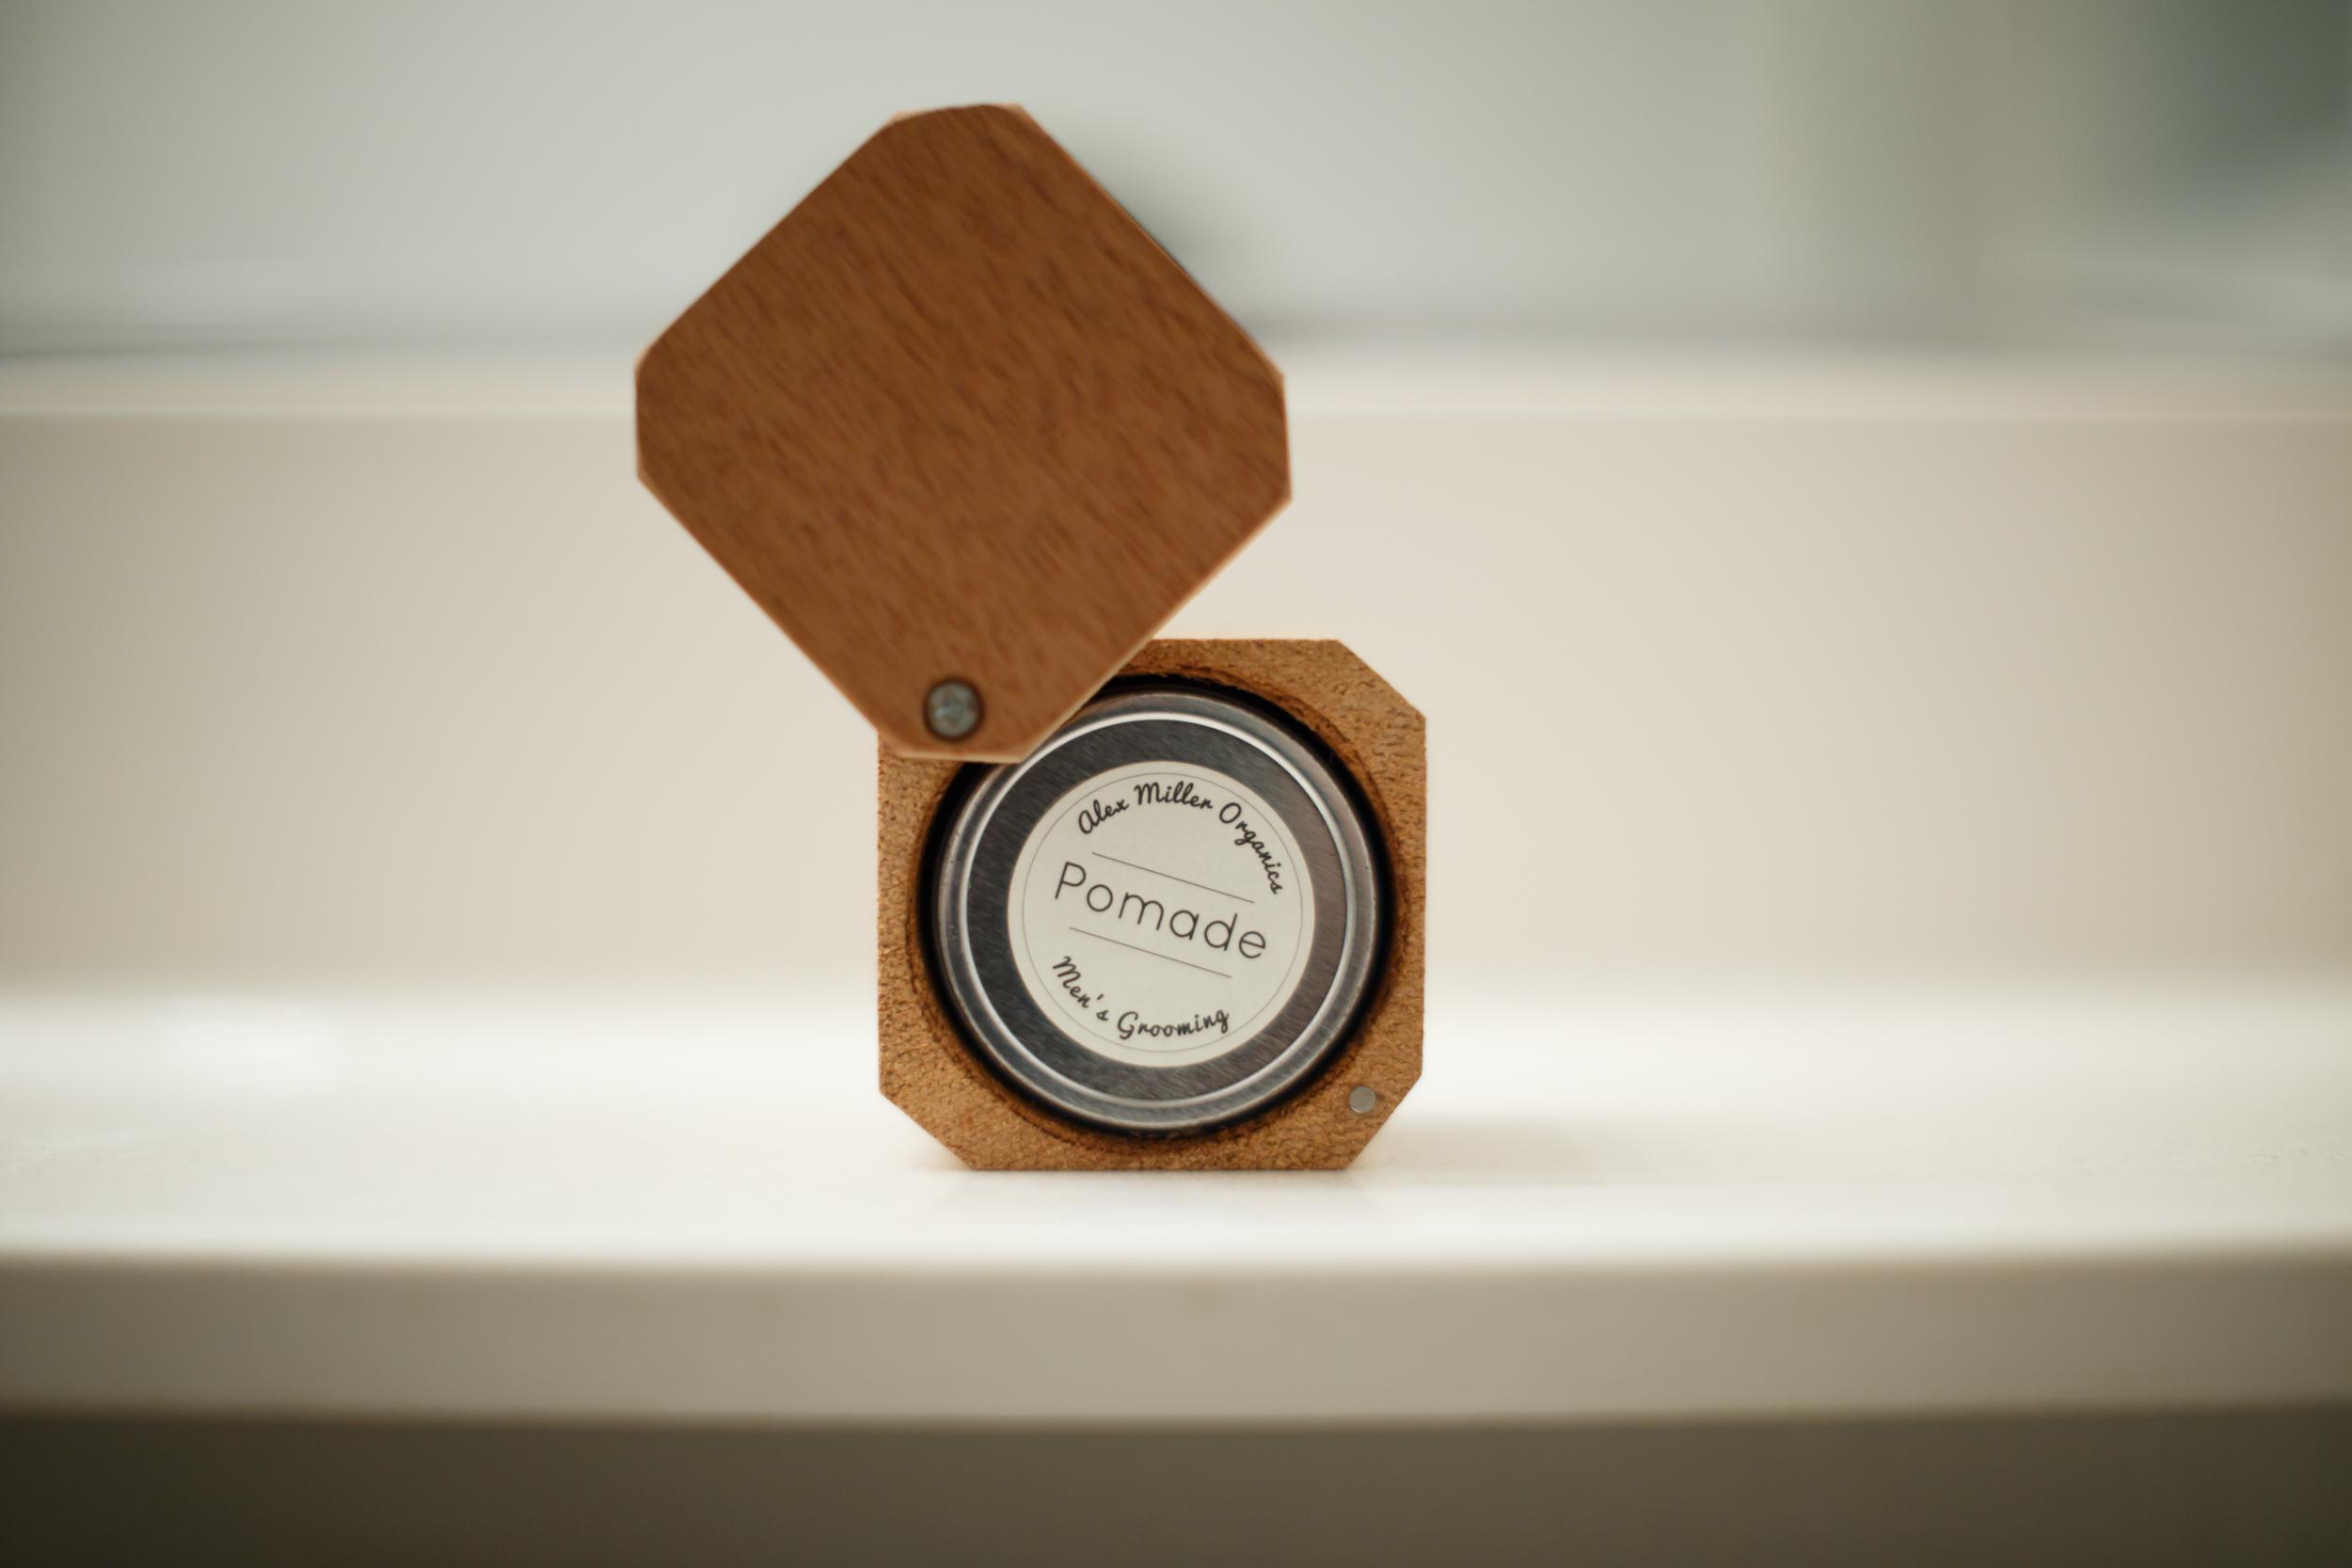 Alex Miller Organics Pomade Review by The Pomp | TYBP Hair Product Texture Salt Sand Clay Dead Sea Saphira